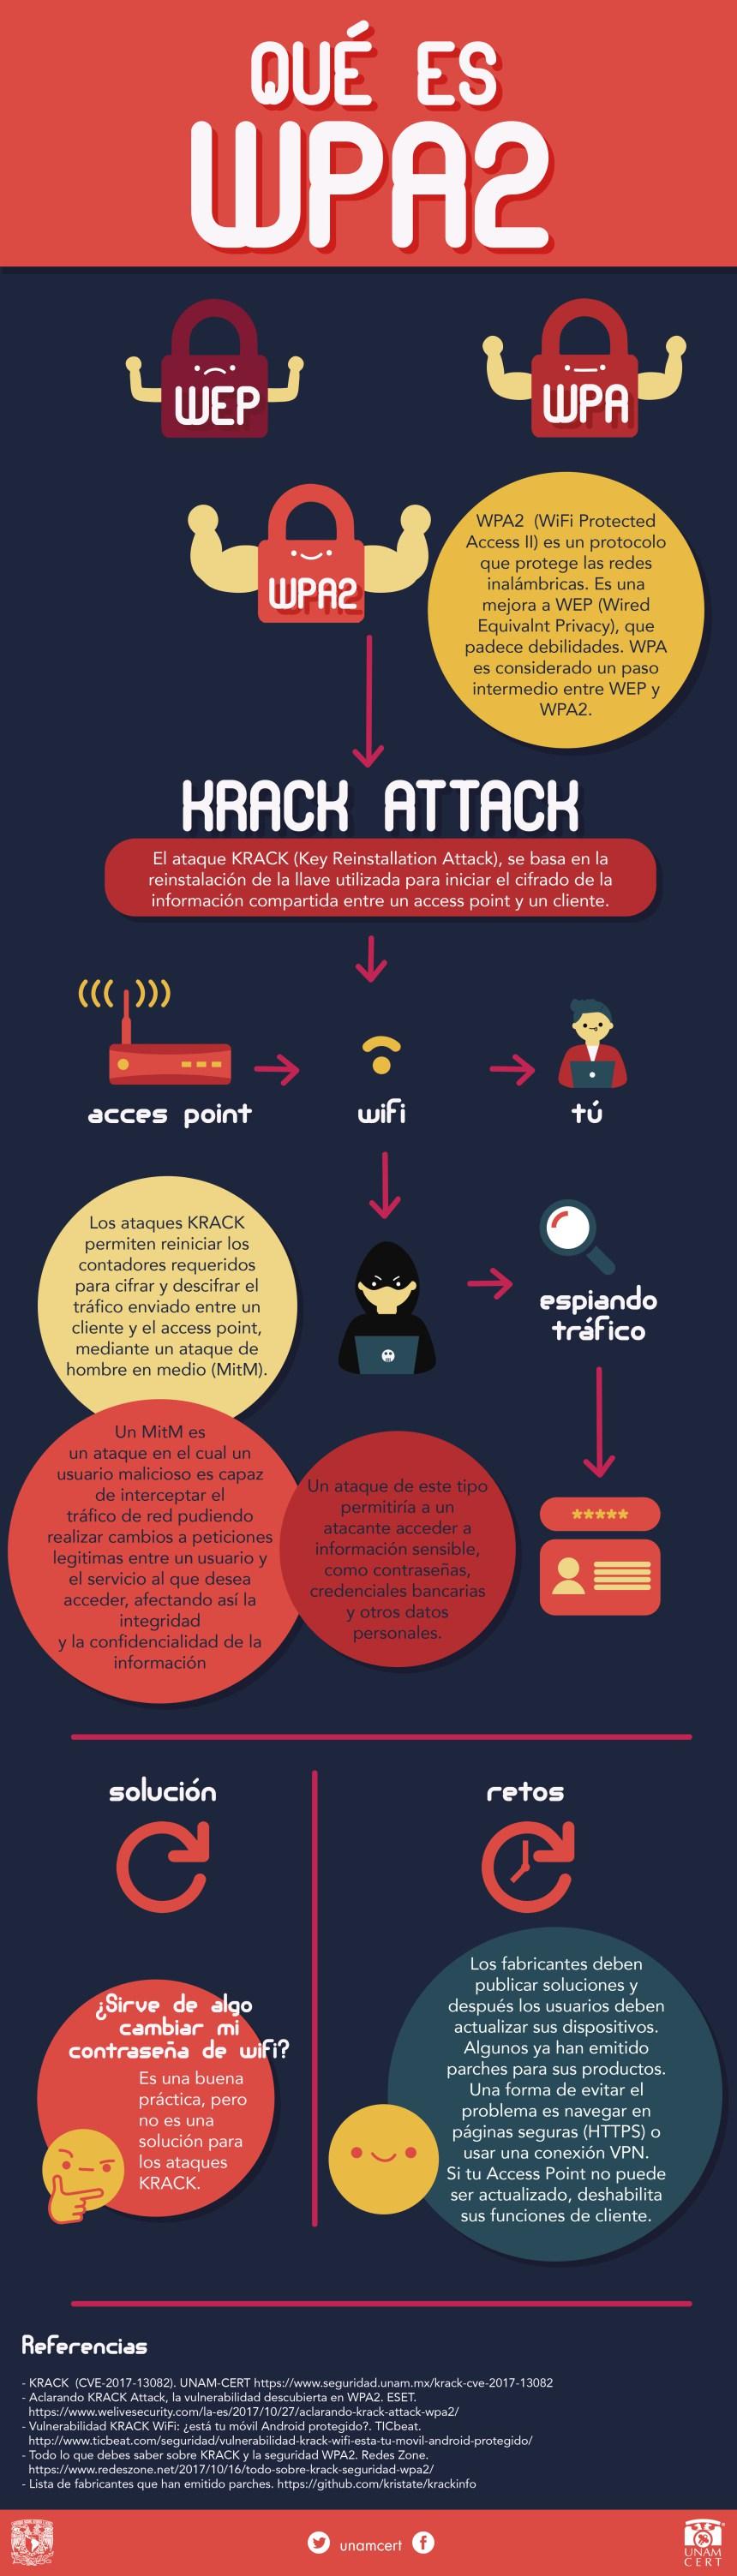 Qué es WPA2 #infografia #infographic #internet